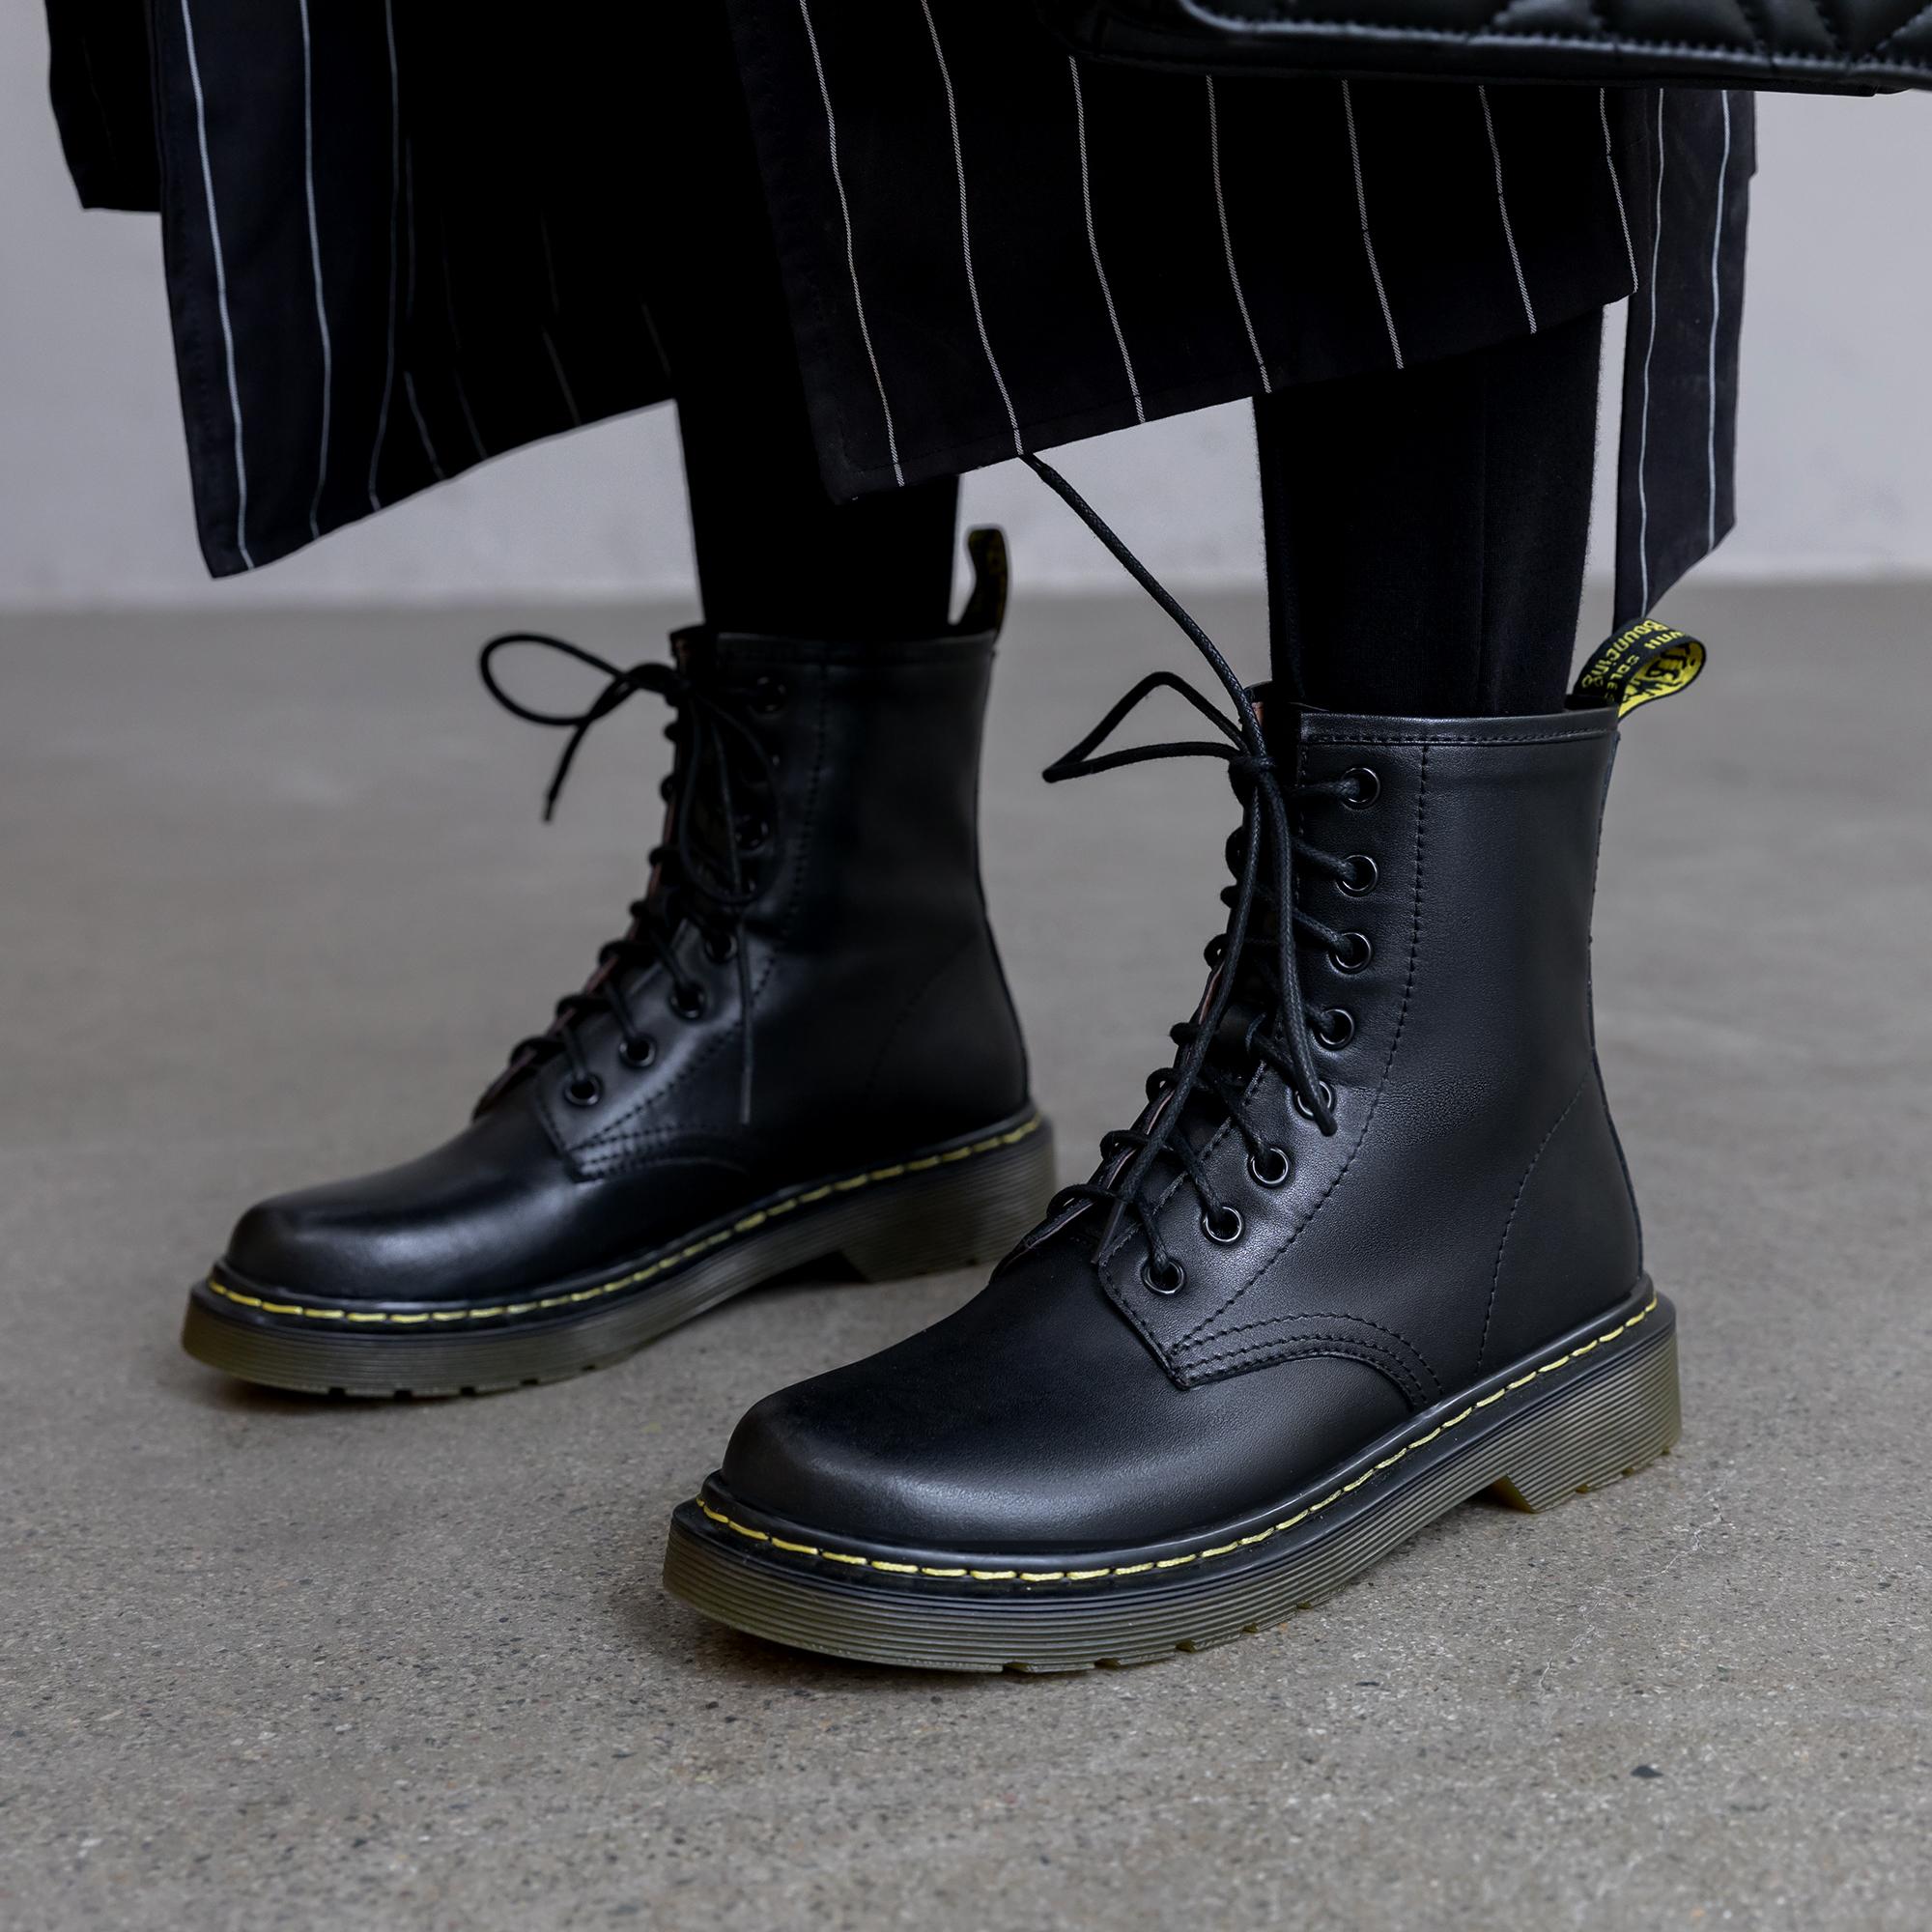 Детские ботинки / Угги Артикул 598991408853